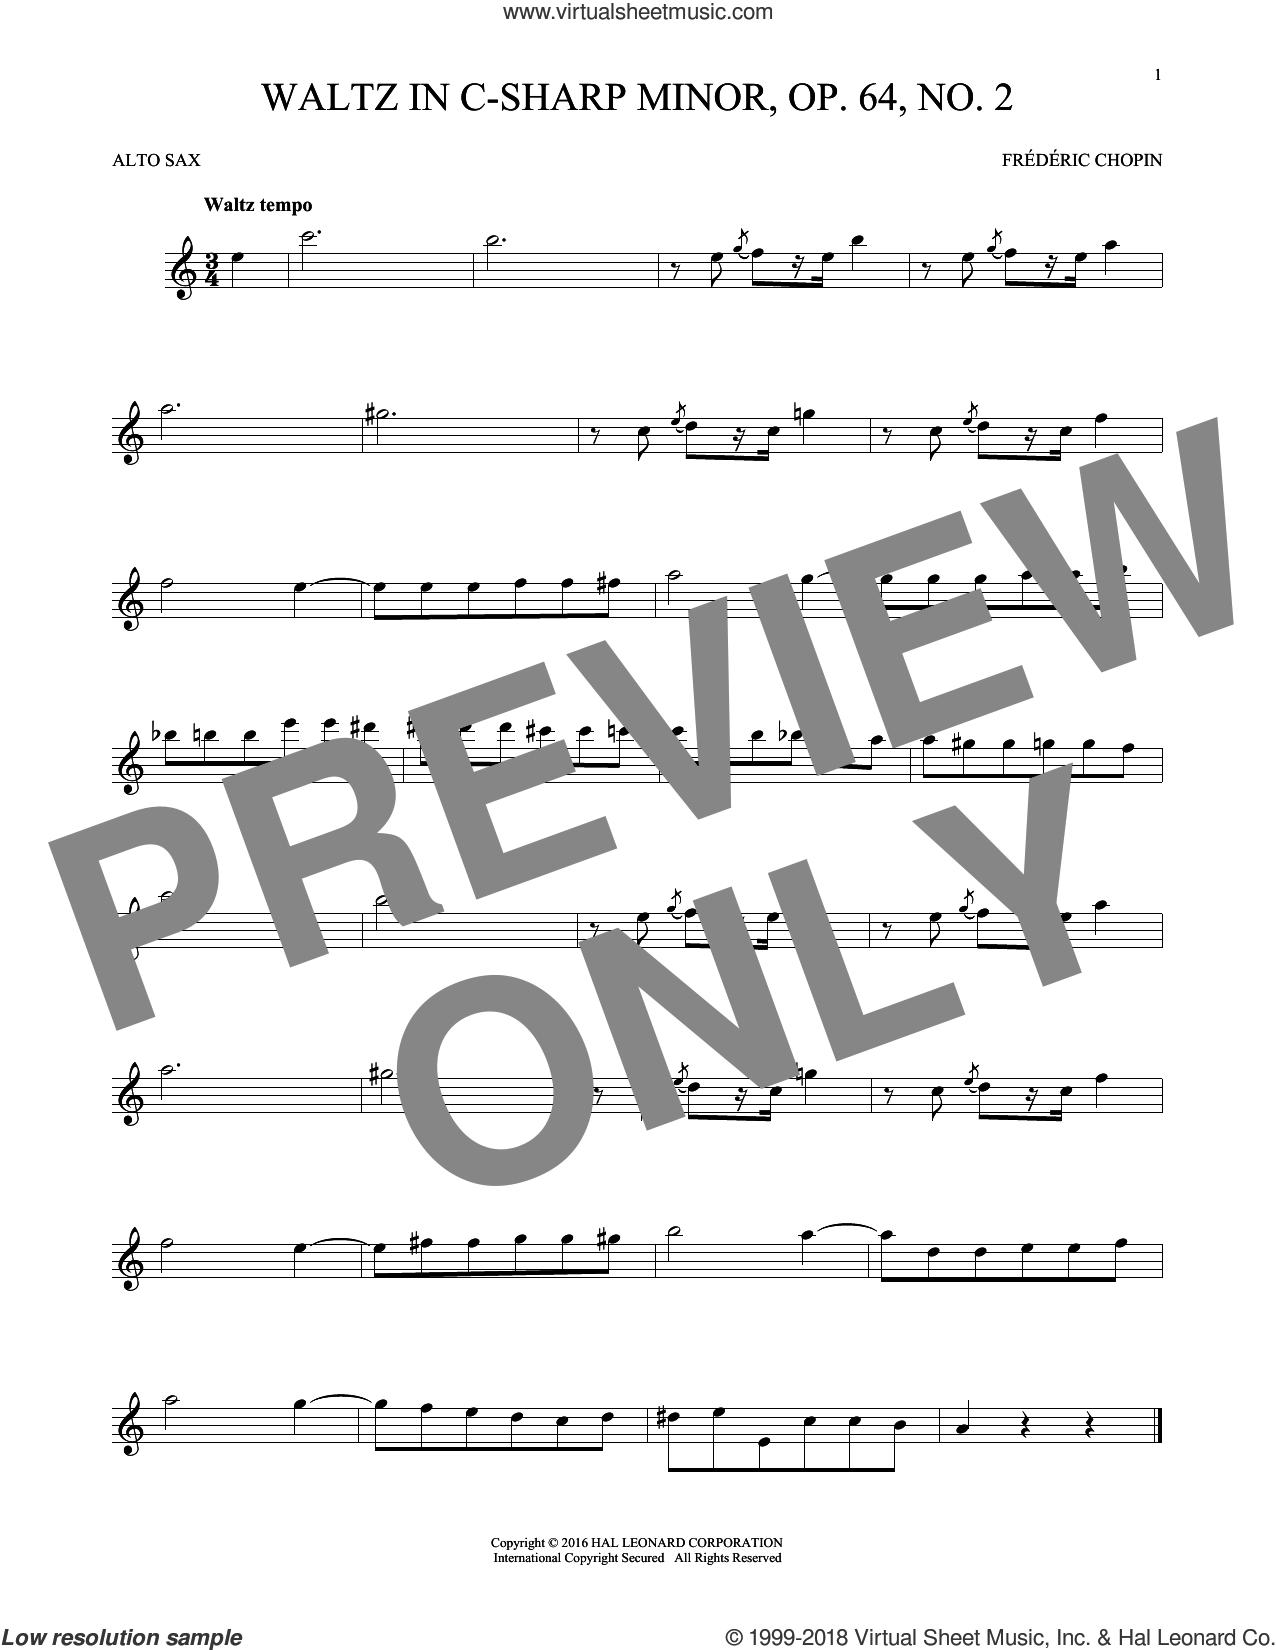 Waltz In C-Sharp Minor, Op. 64, No. 2 sheet music for alto saxophone solo by Frederic Chopin, classical score, intermediate skill level